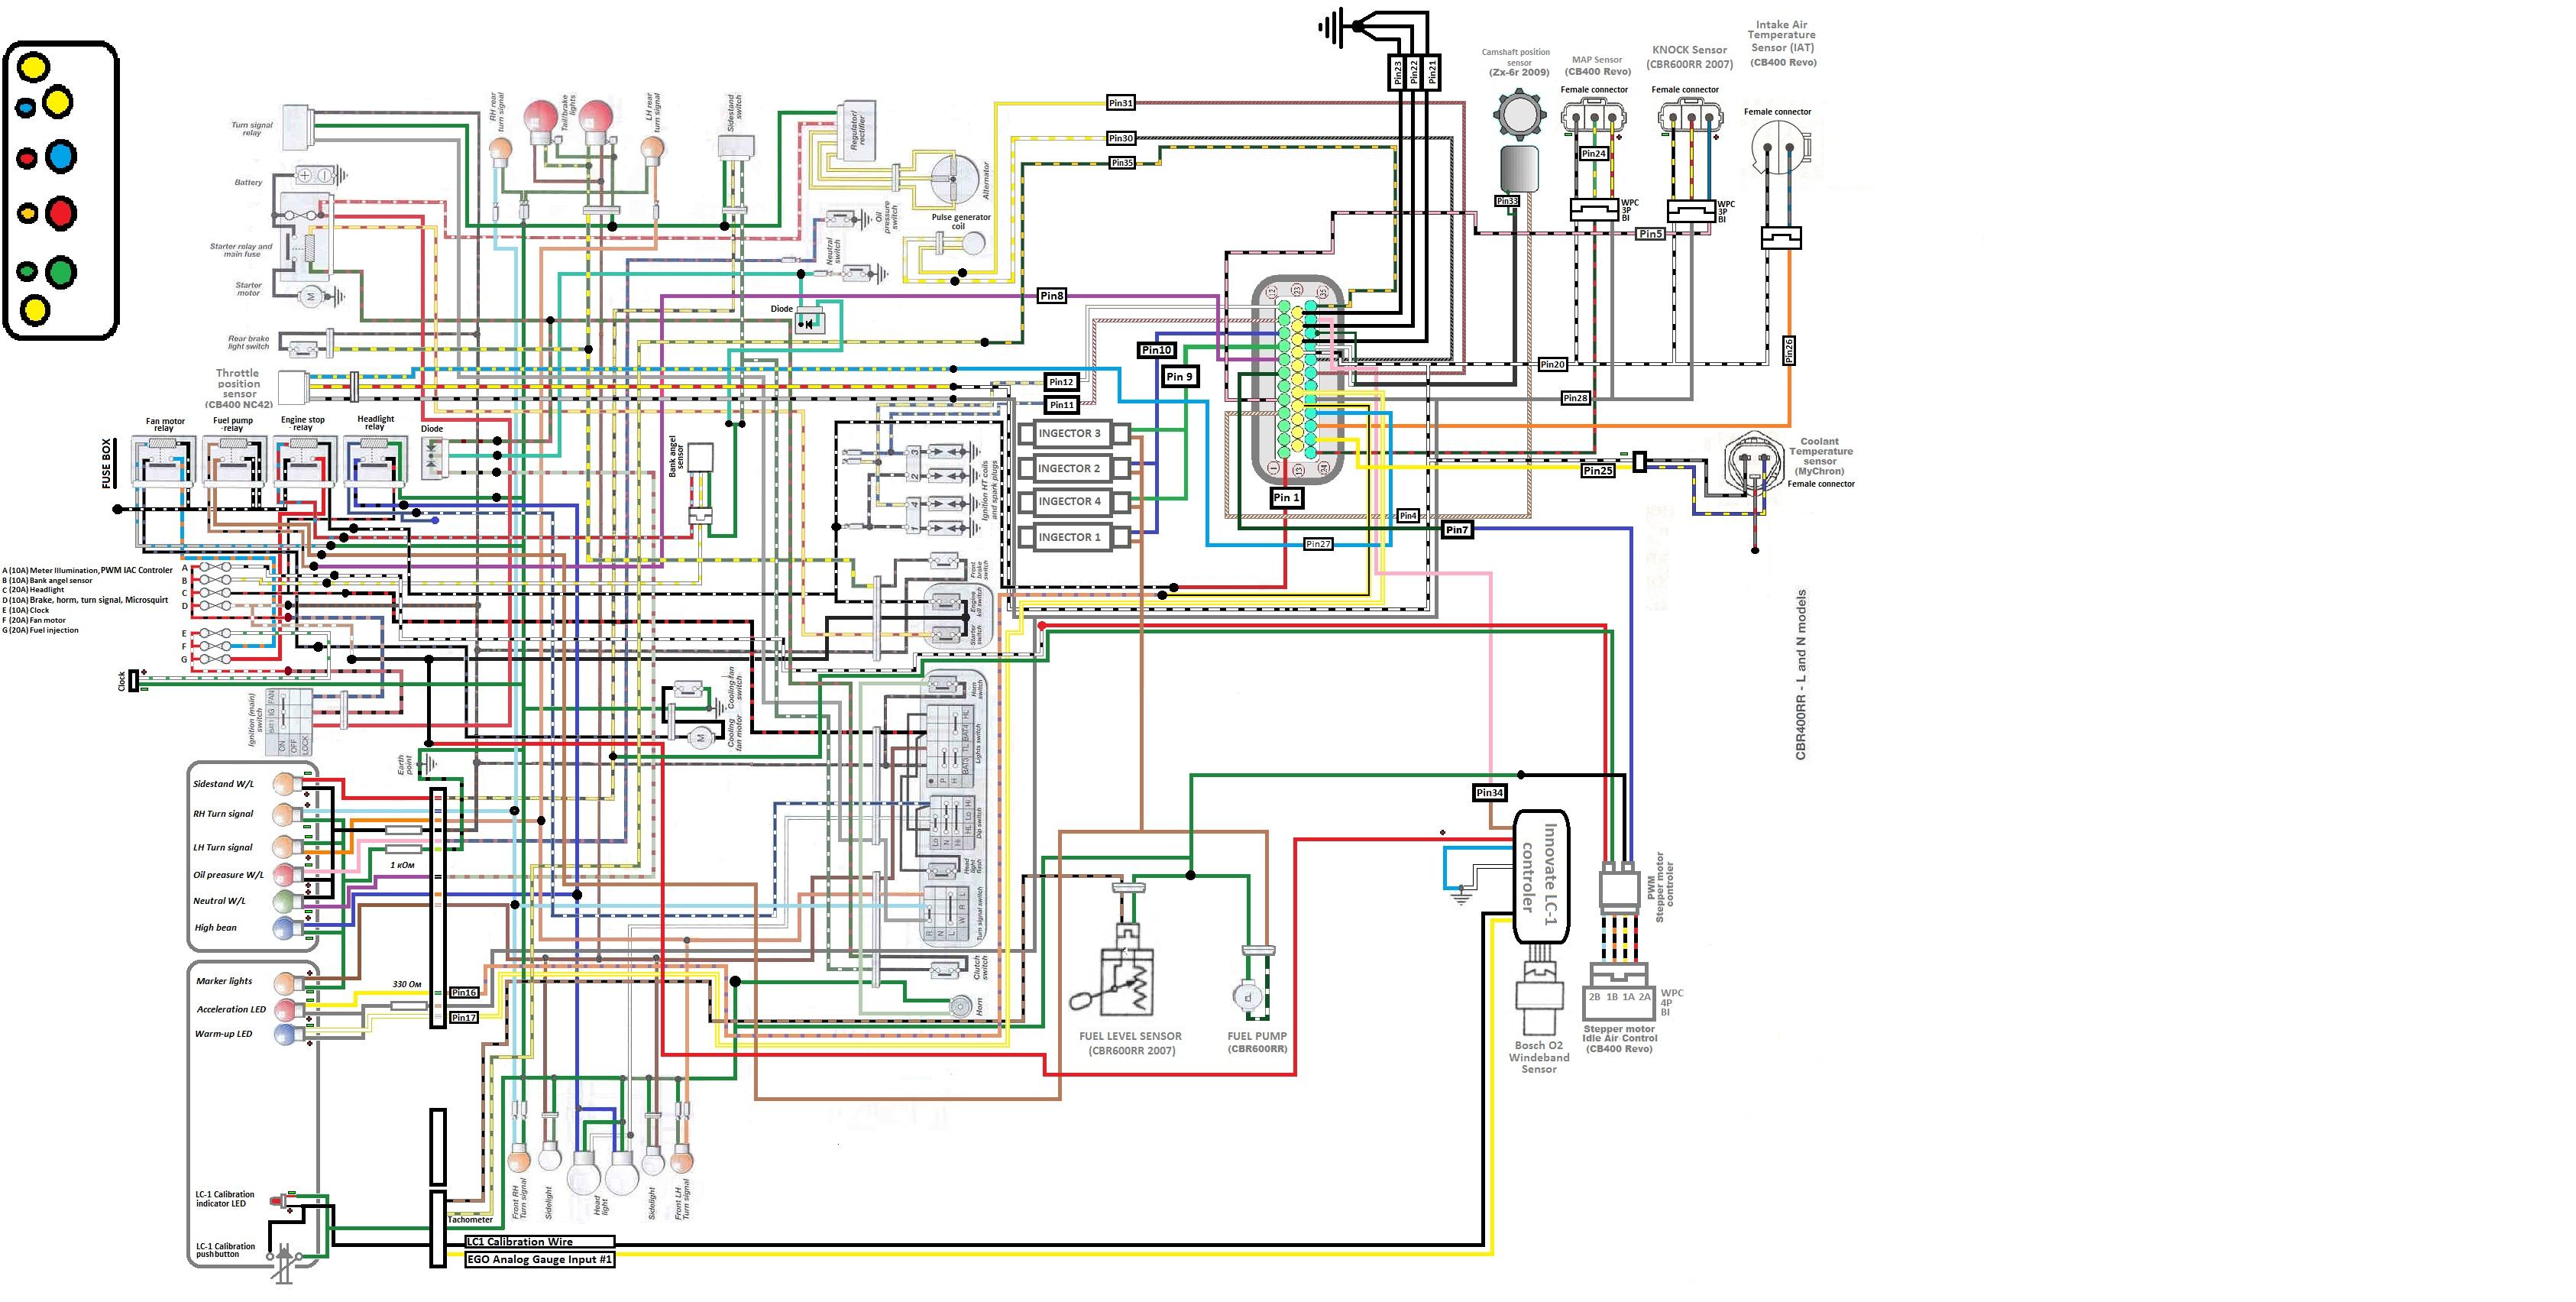 Tremendous Gs850 Wiring Diagram Wiring Library Wiring Cloud Filiciilluminateatxorg